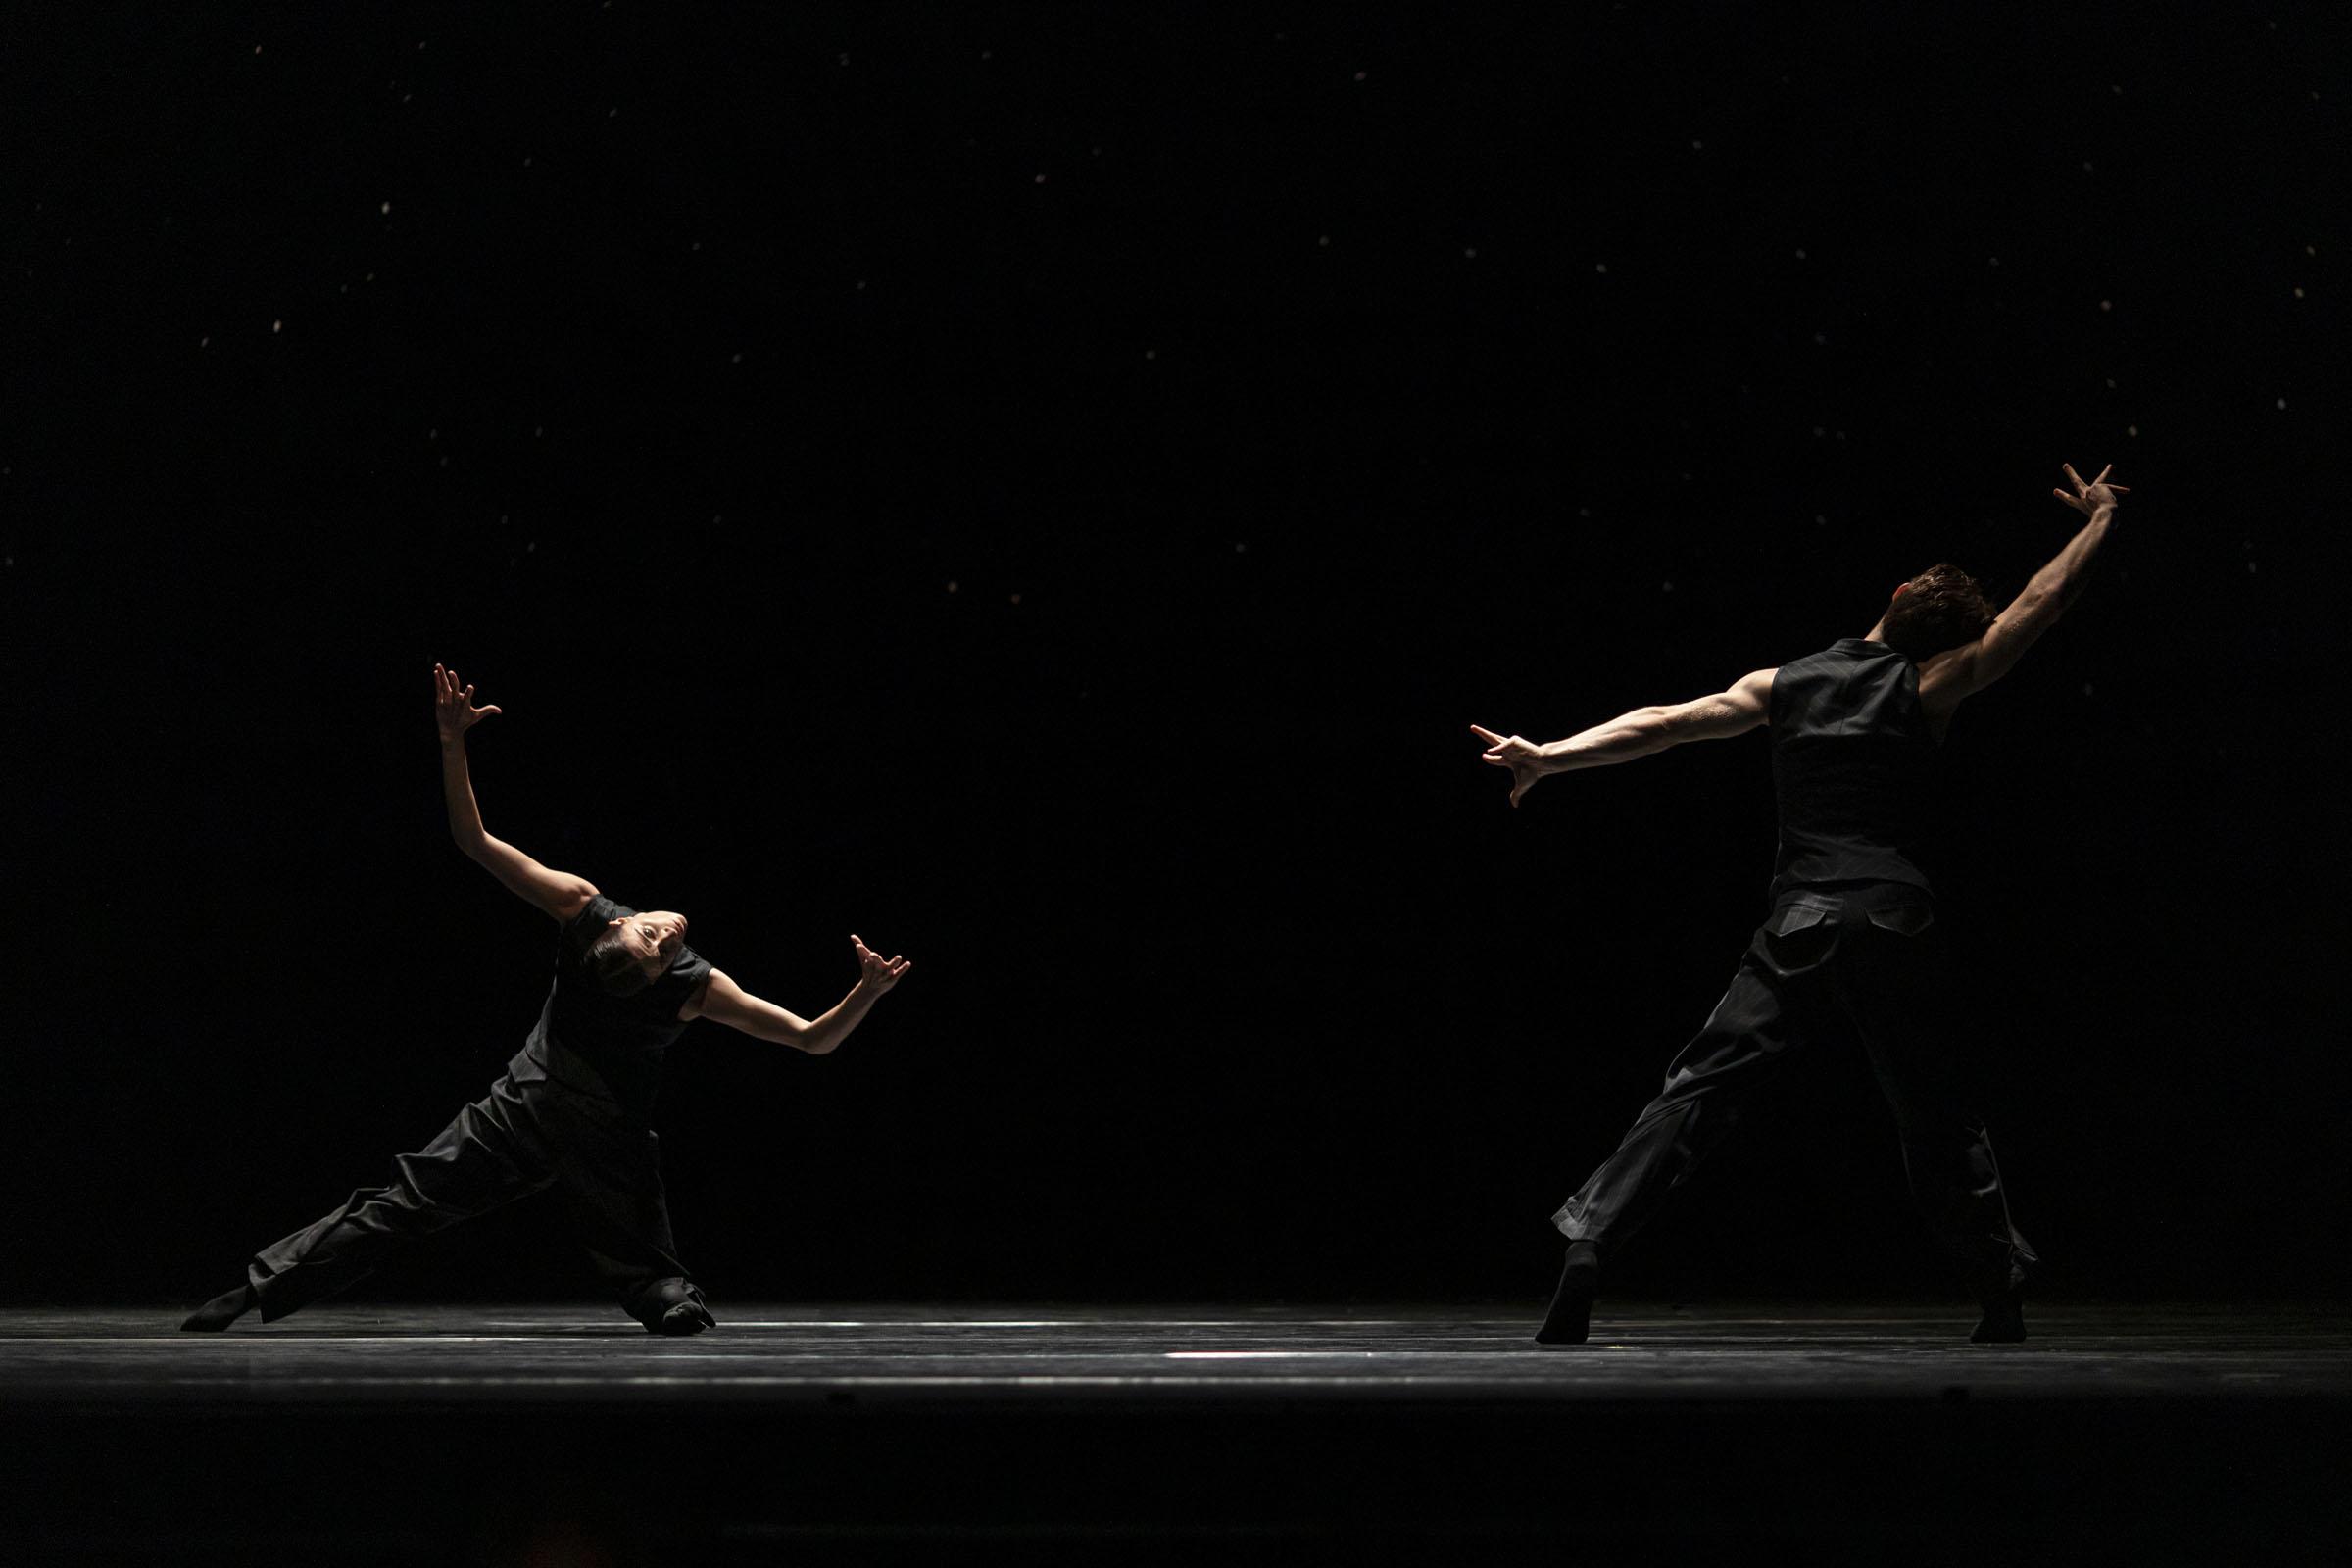 'Solo Echo', part of '21st Century Choreographers' at The Royal Opera House.